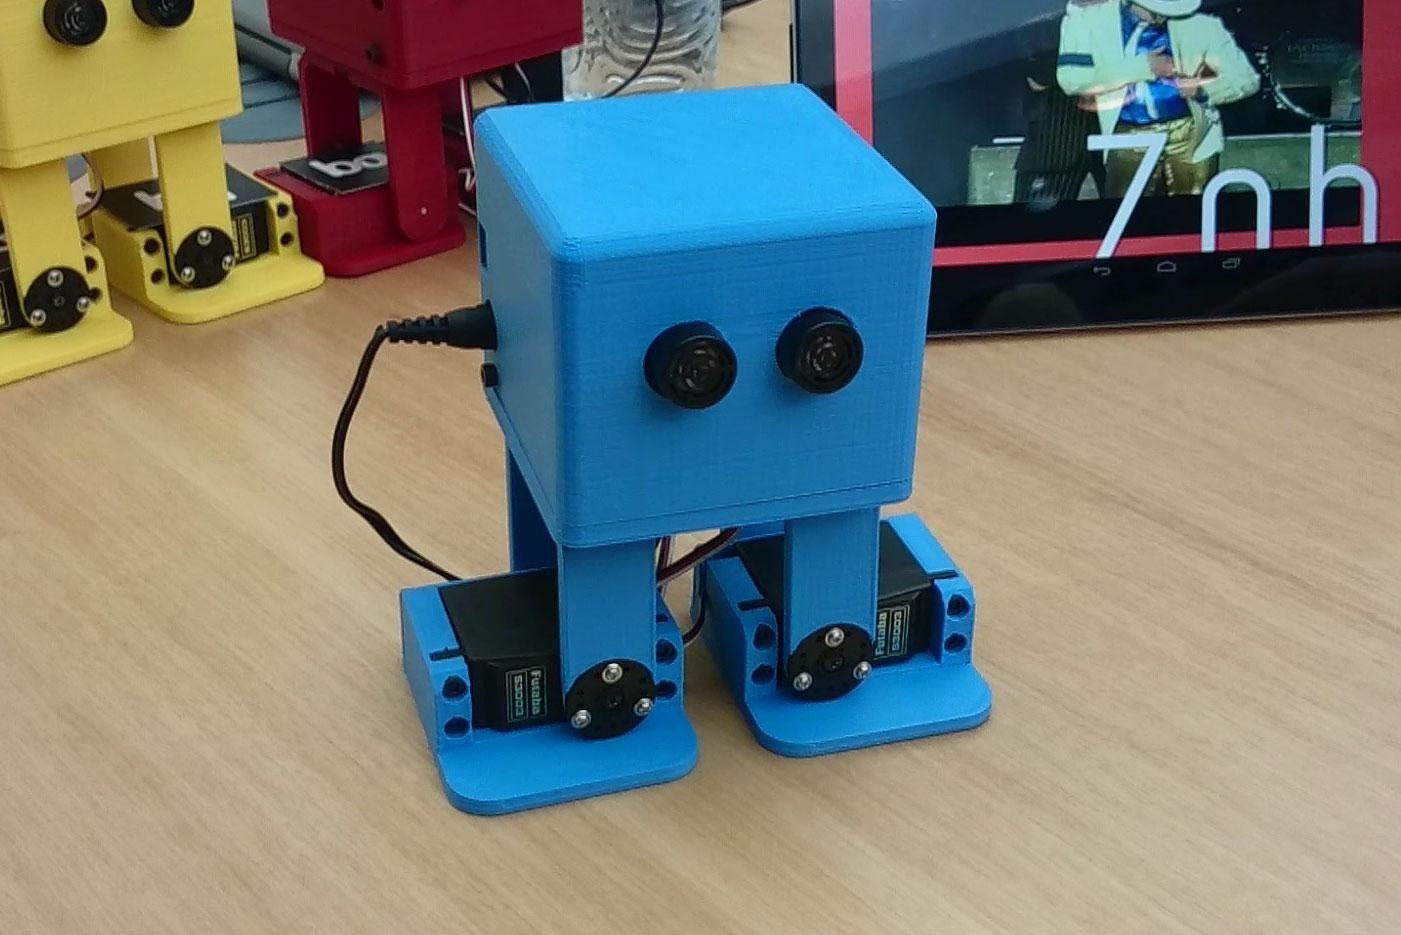 Робот, танцующий как Майкл Джексон